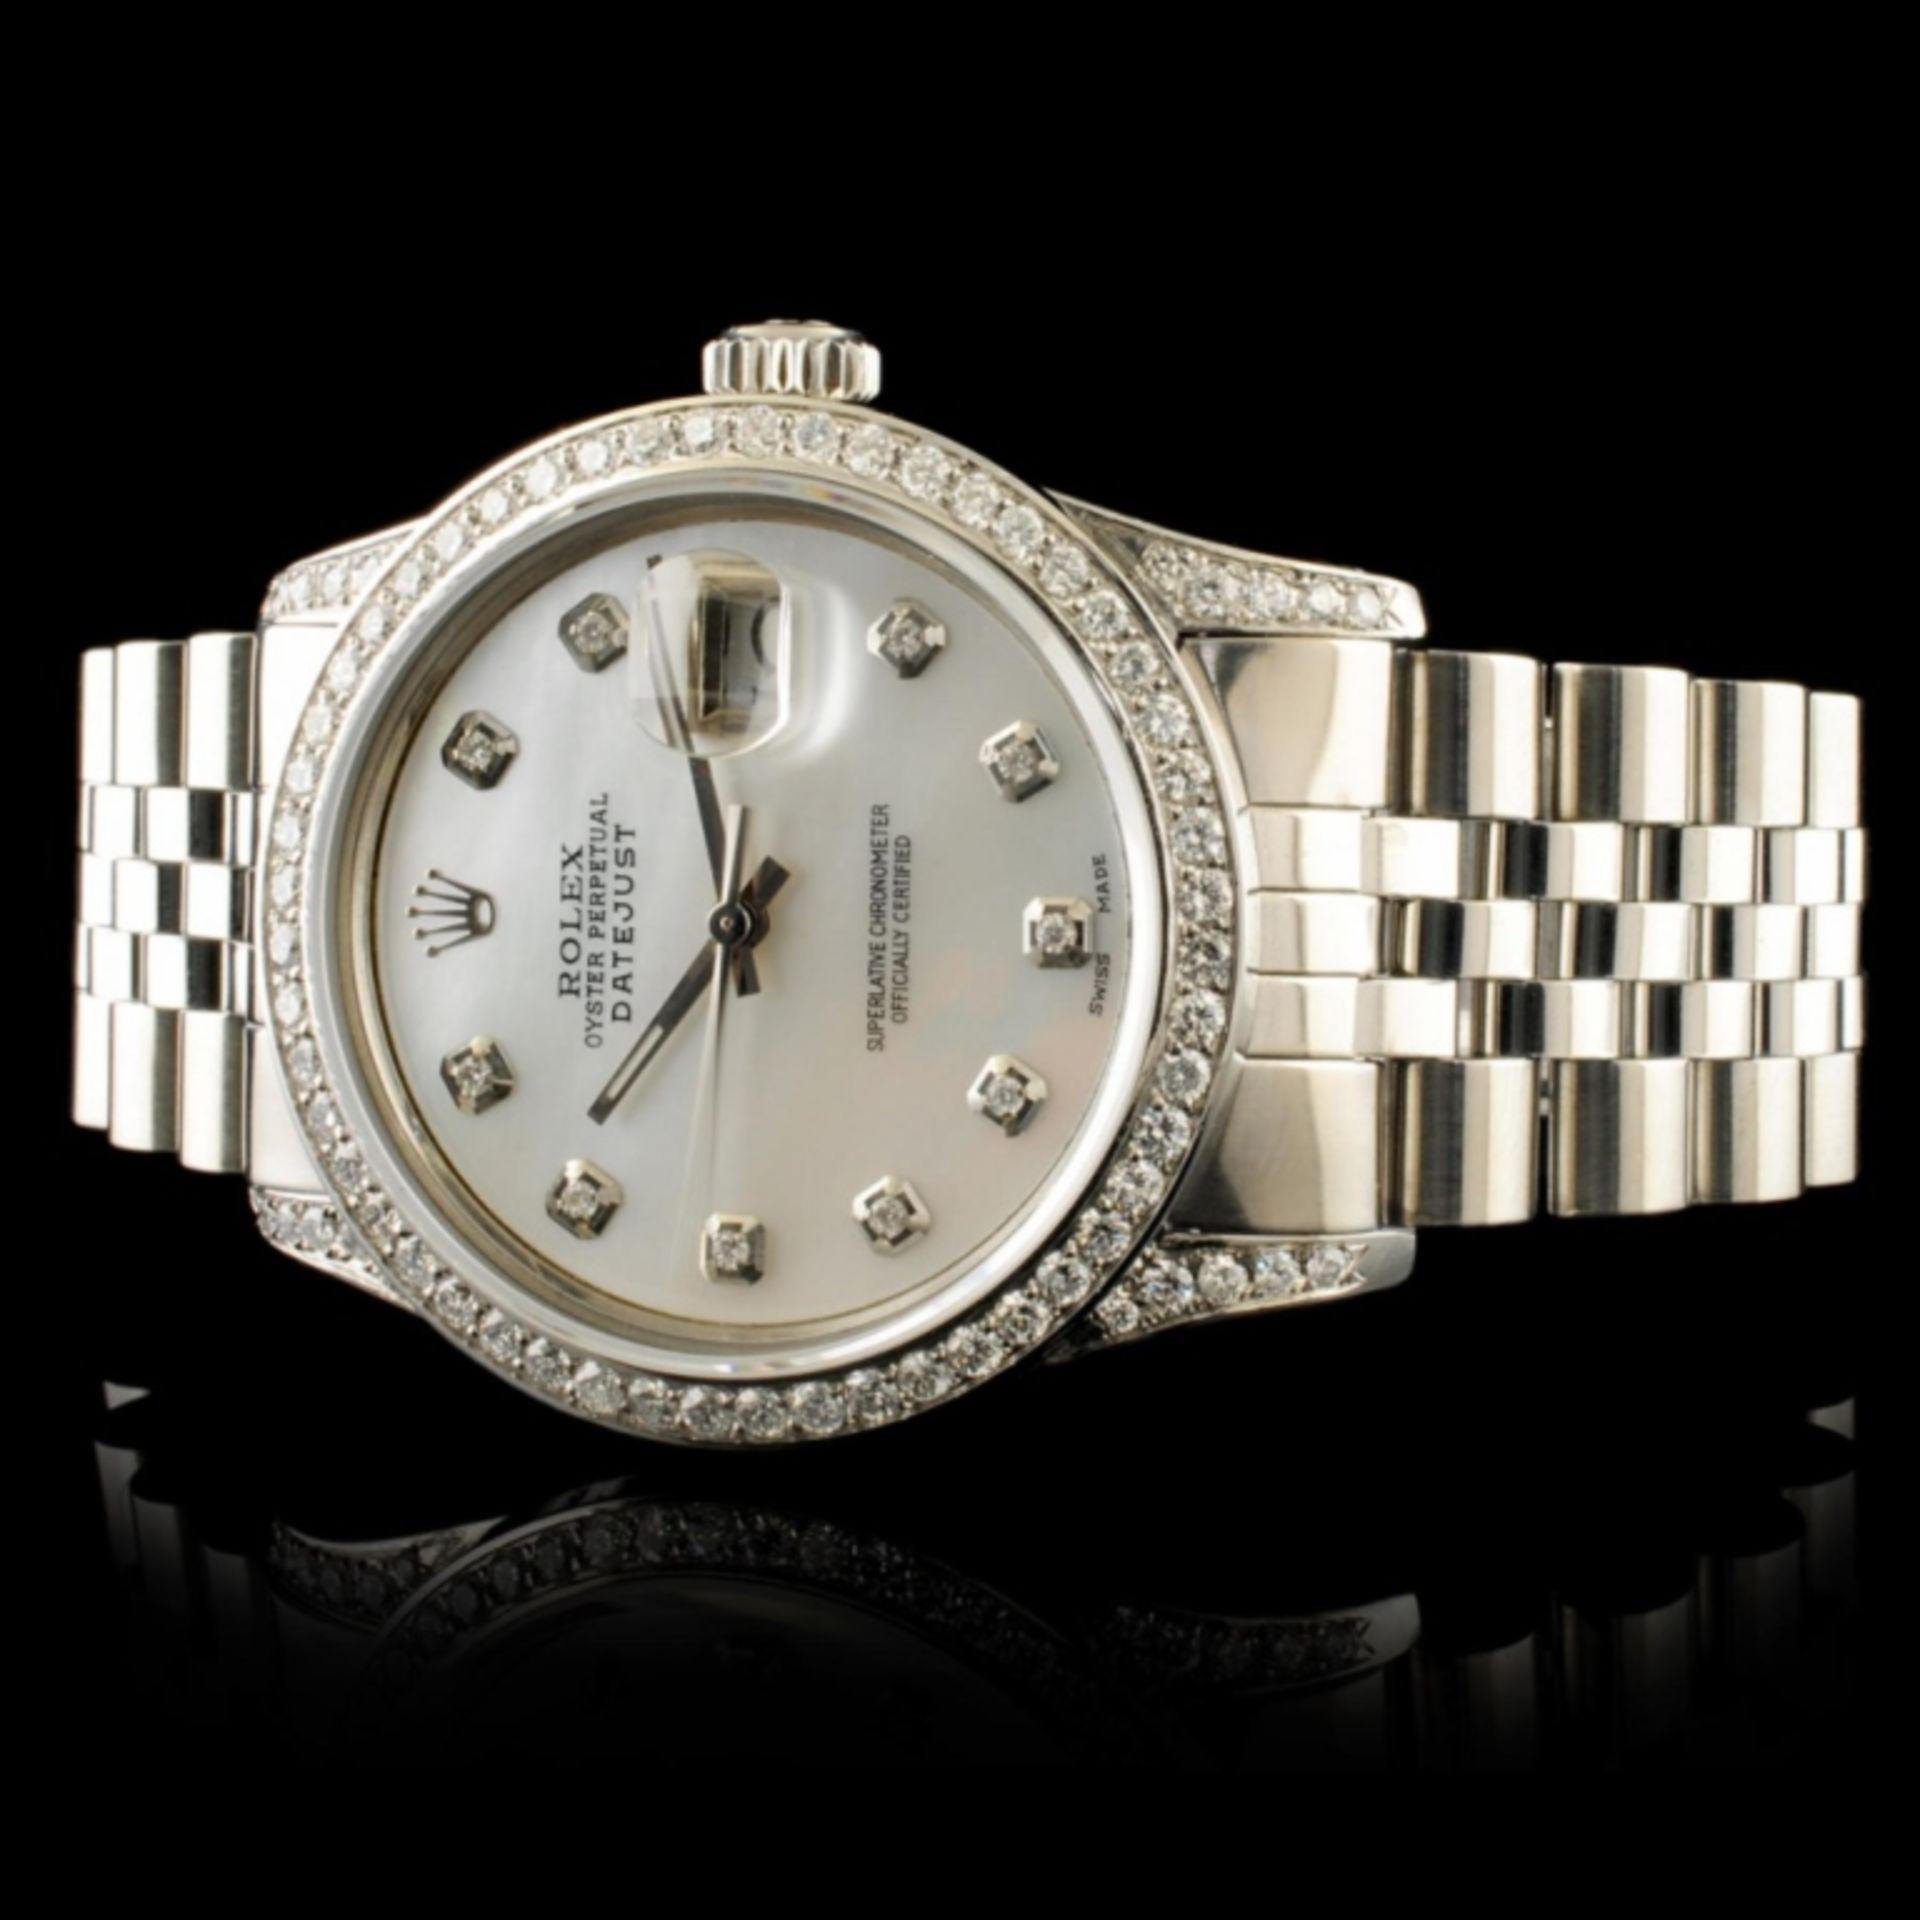 Rolex DateJust 1.50ctw Diamond 36MM Wristwatch - Image 3 of 6